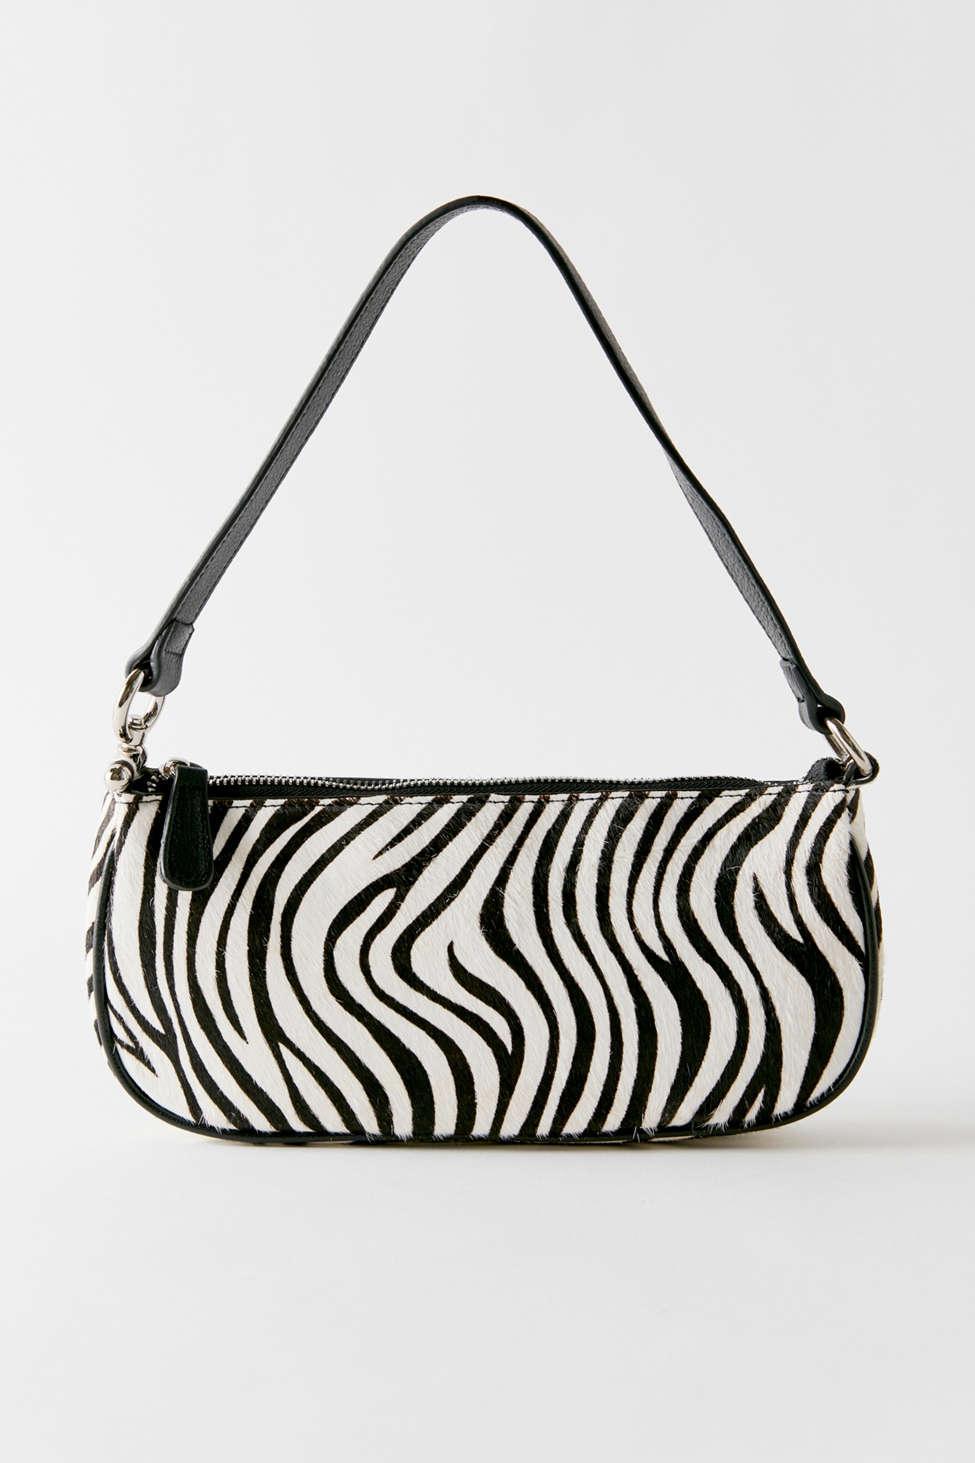 Zebra Print Baguette Bag In Black